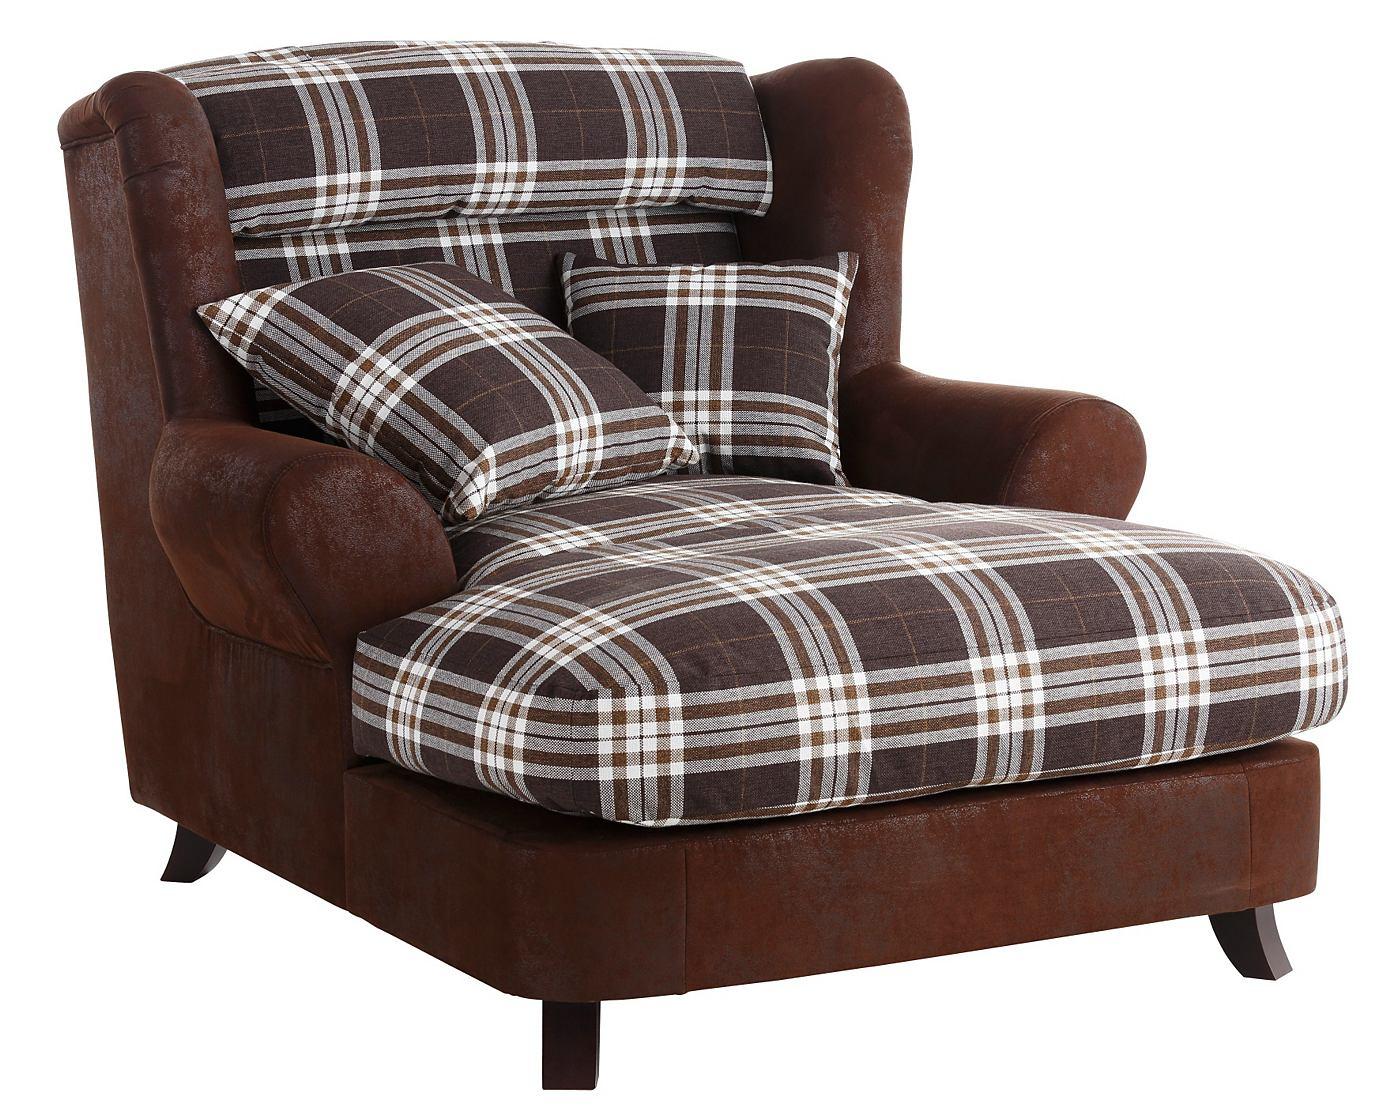 Woonkamer fauteuils